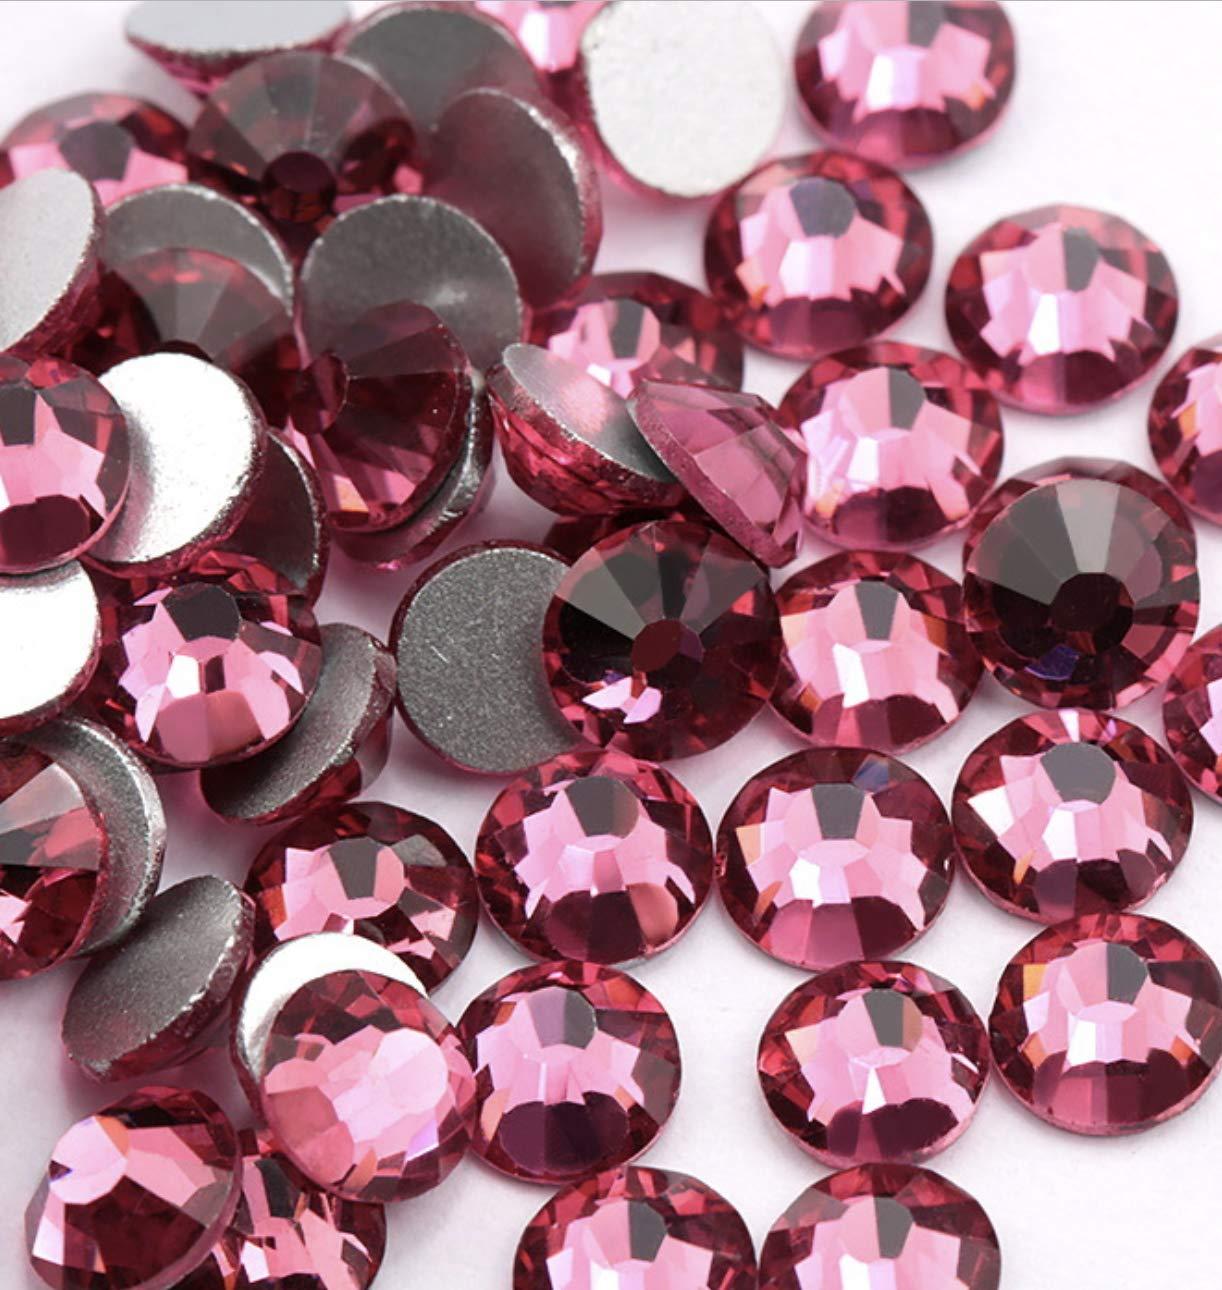 40 Jet Black 16 mm Love Heart Acrylic Rhinestone Gems Faceted Flatback Sew on